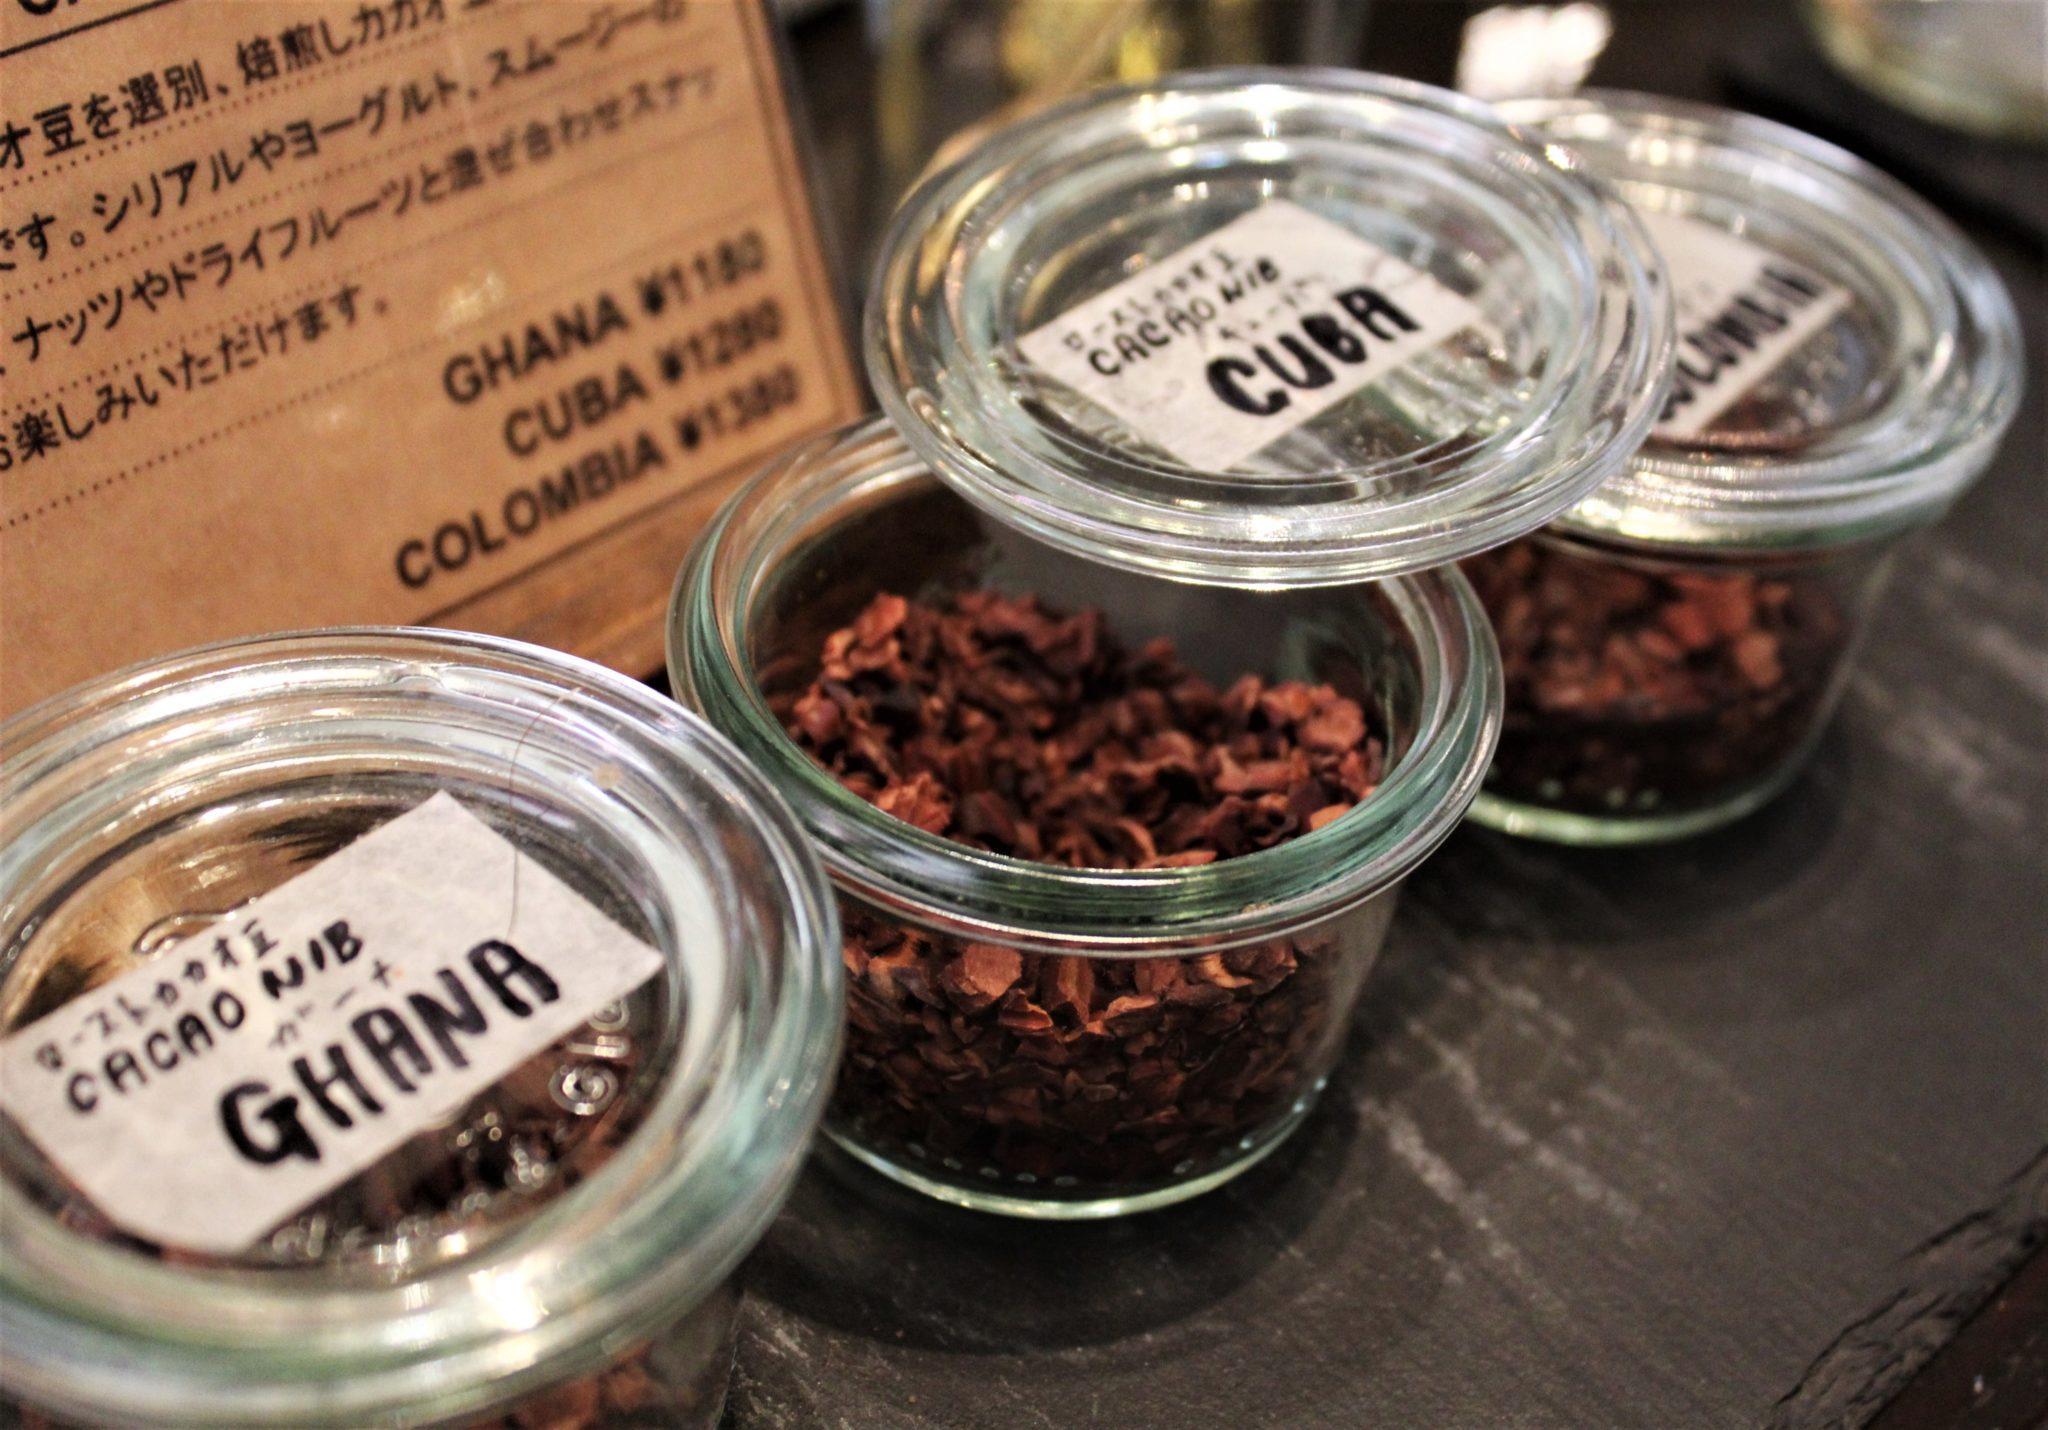 Timeless chocolate okinawa japan cacao nibs